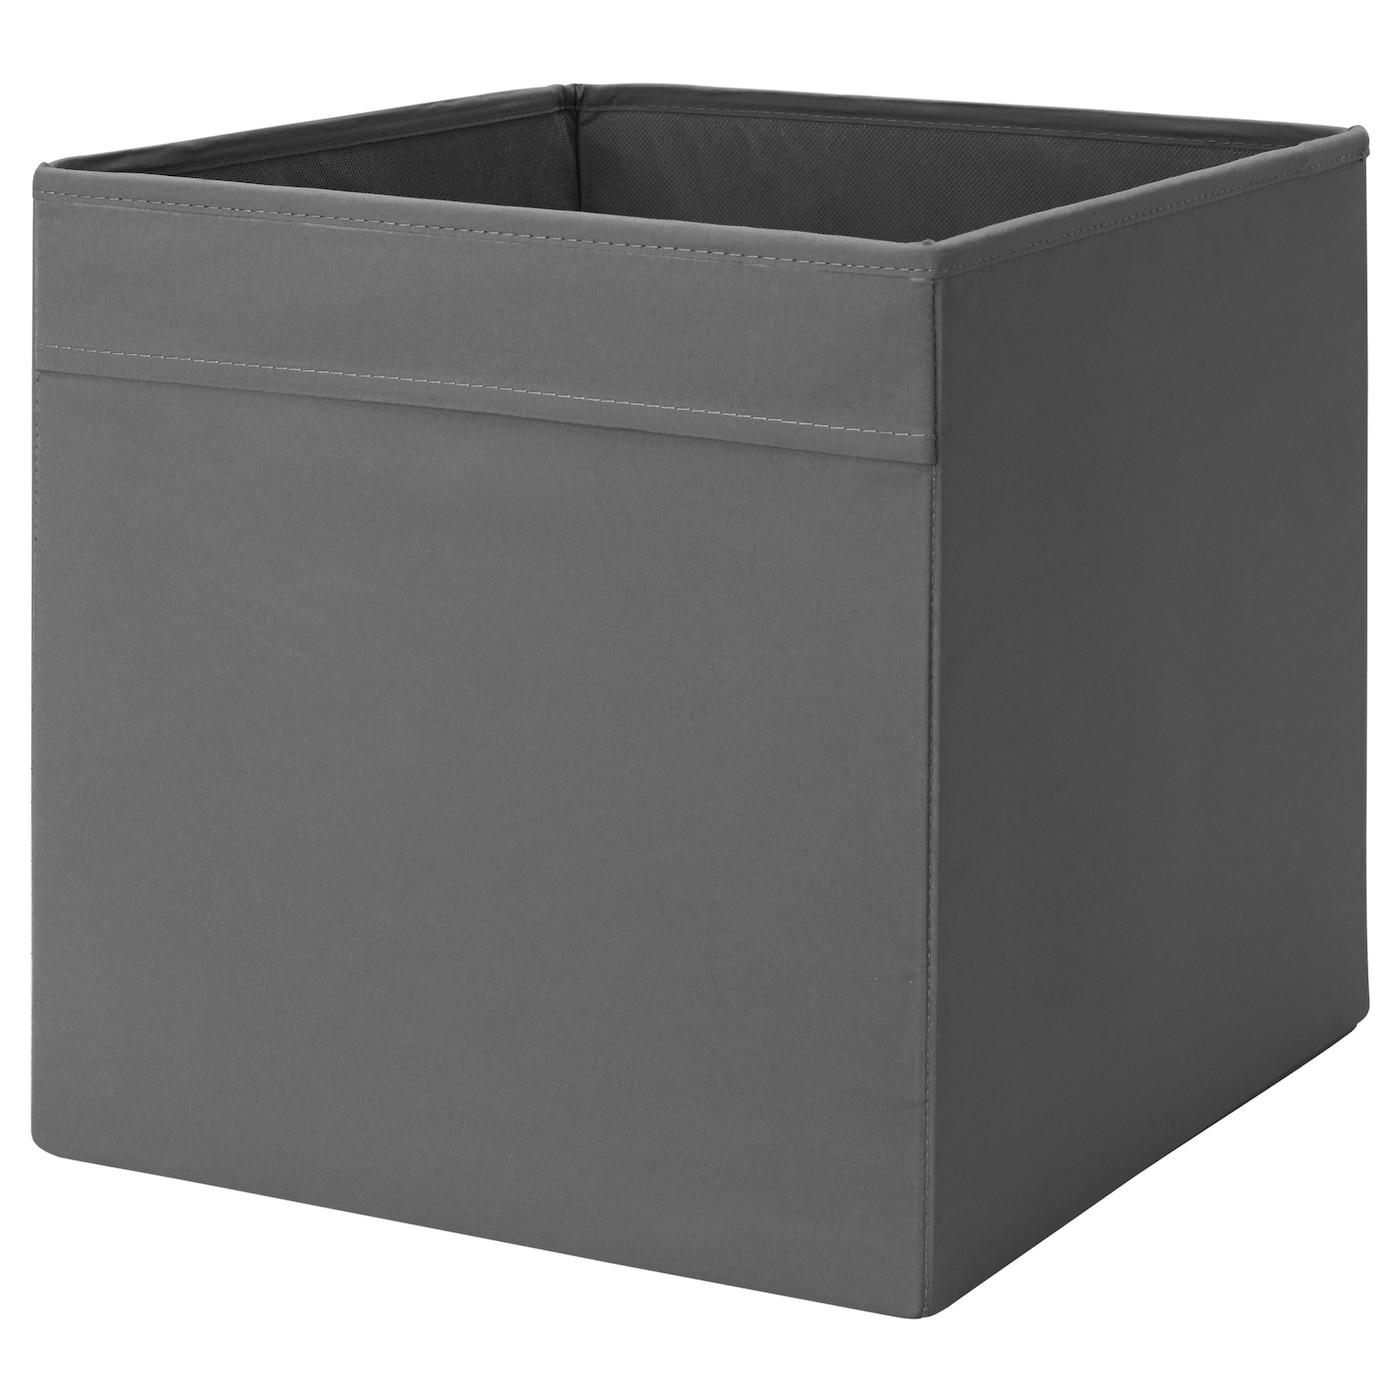 boite panier de rangement ikea. Black Bedroom Furniture Sets. Home Design Ideas